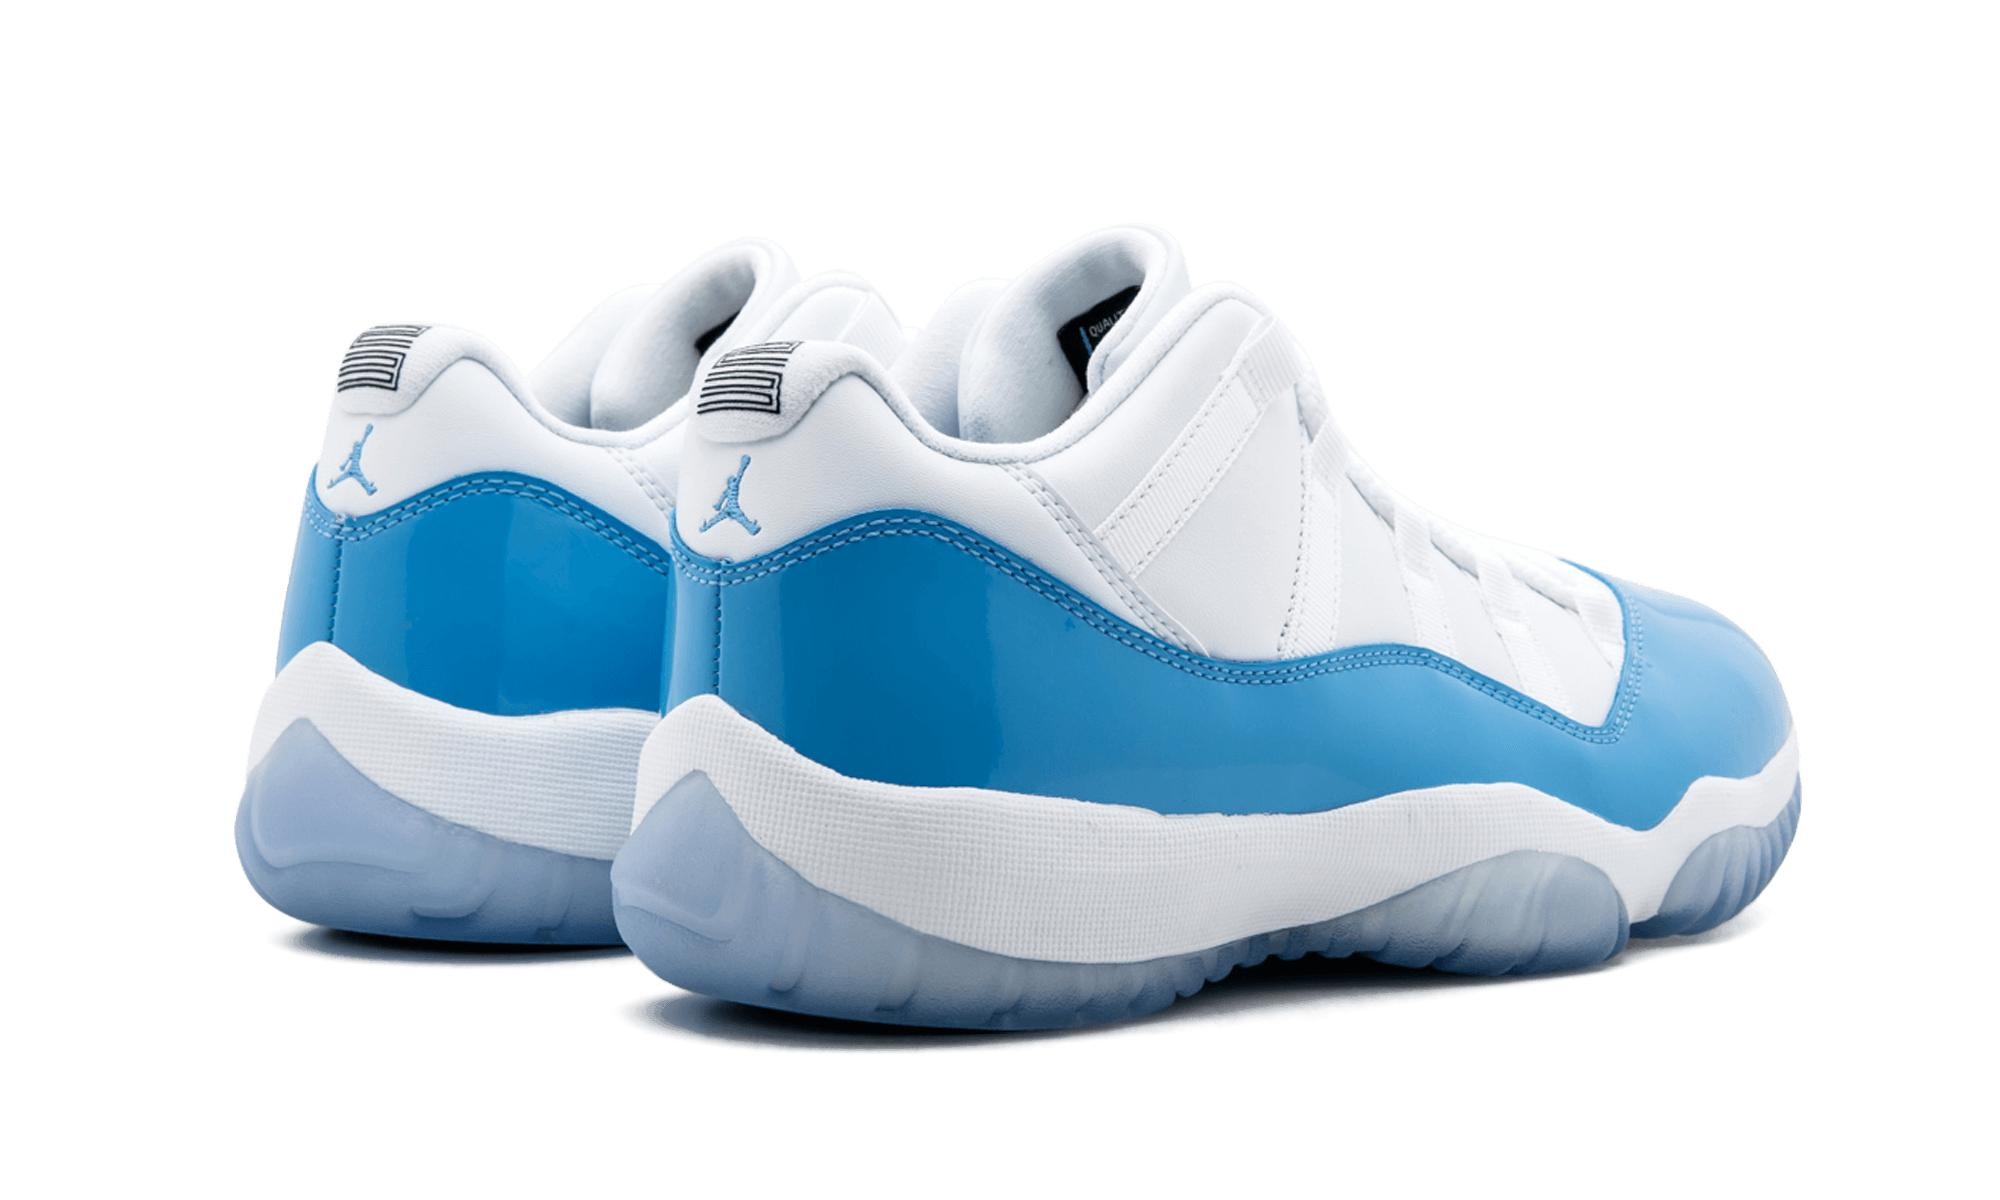 sports shoes f3b27 99cad Nike - Blue Air 11 Retro Low for Men - Lyst. View fullscreen